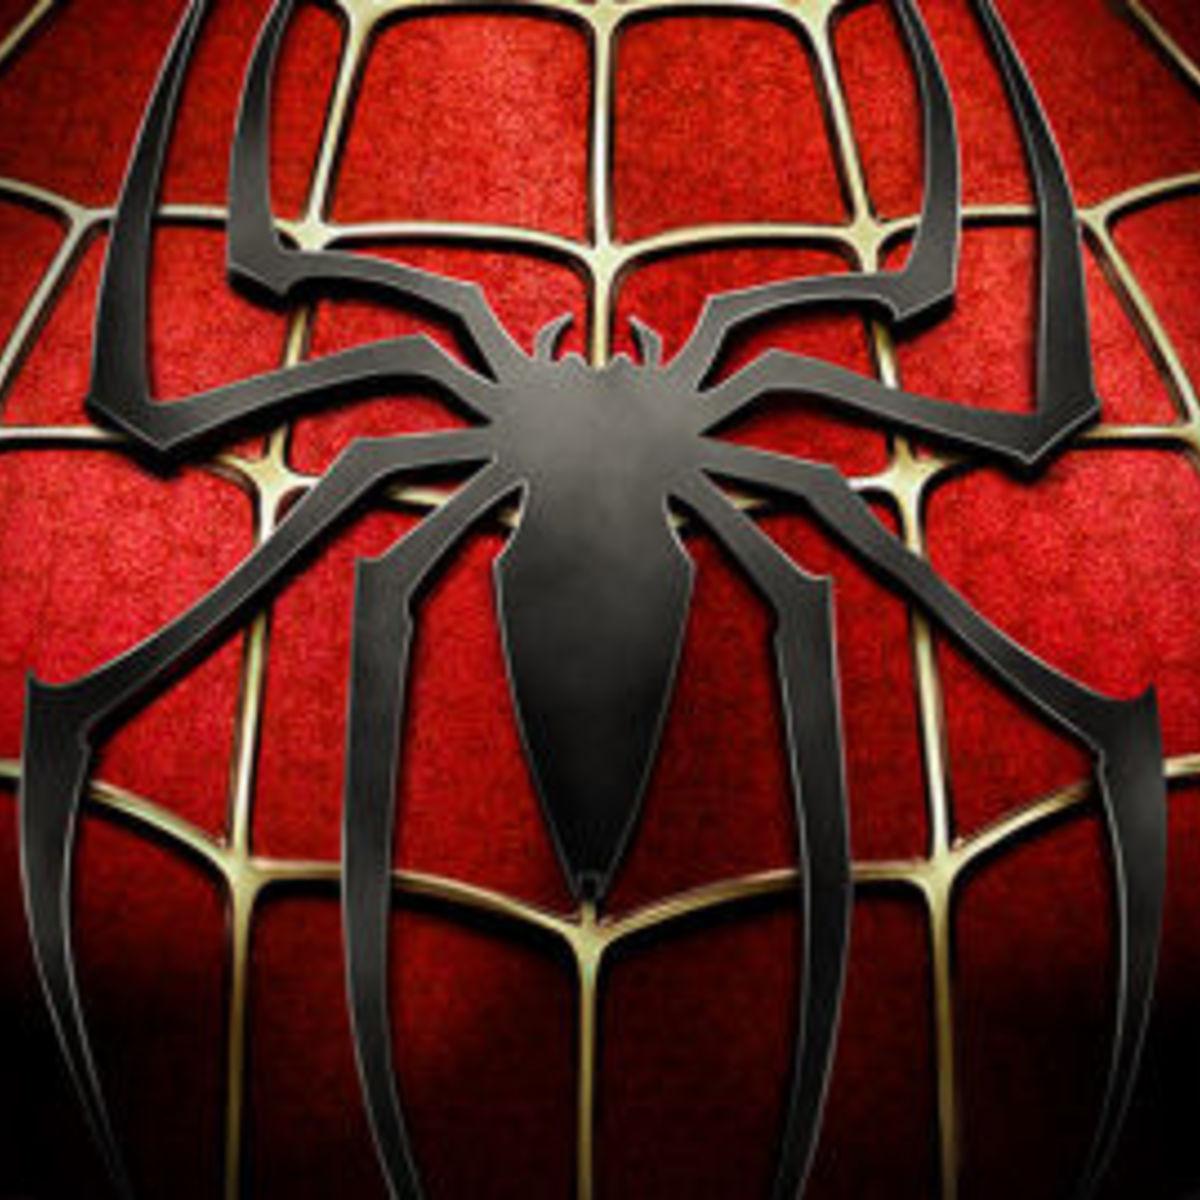 SpiderMan_logo_4.jpg